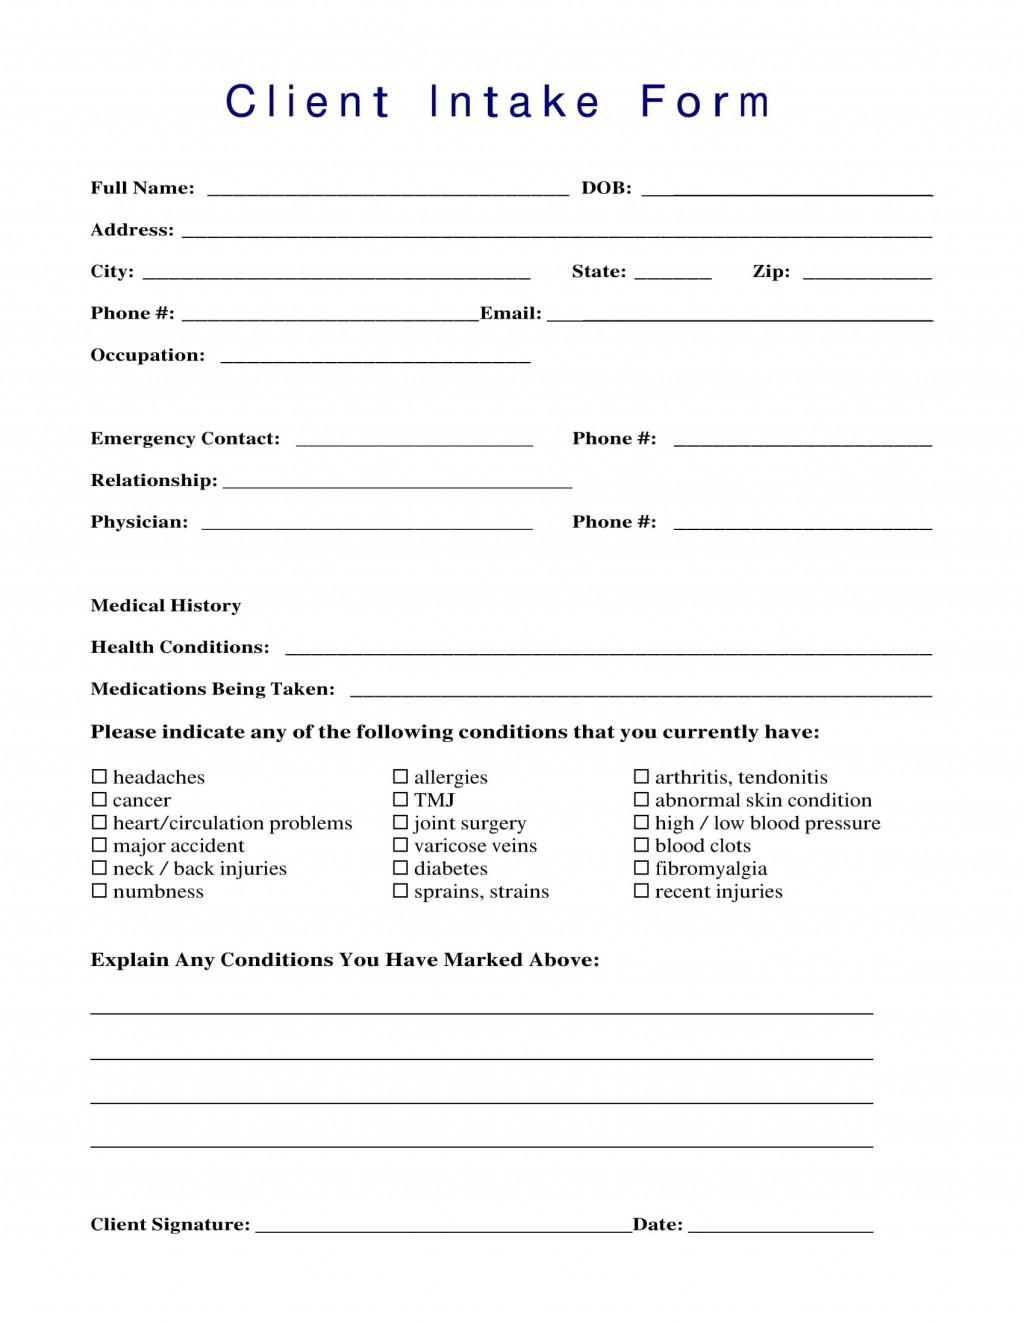 002 Marvelou Patient Intake Form Template Design  Word Client Excel PdfLarge